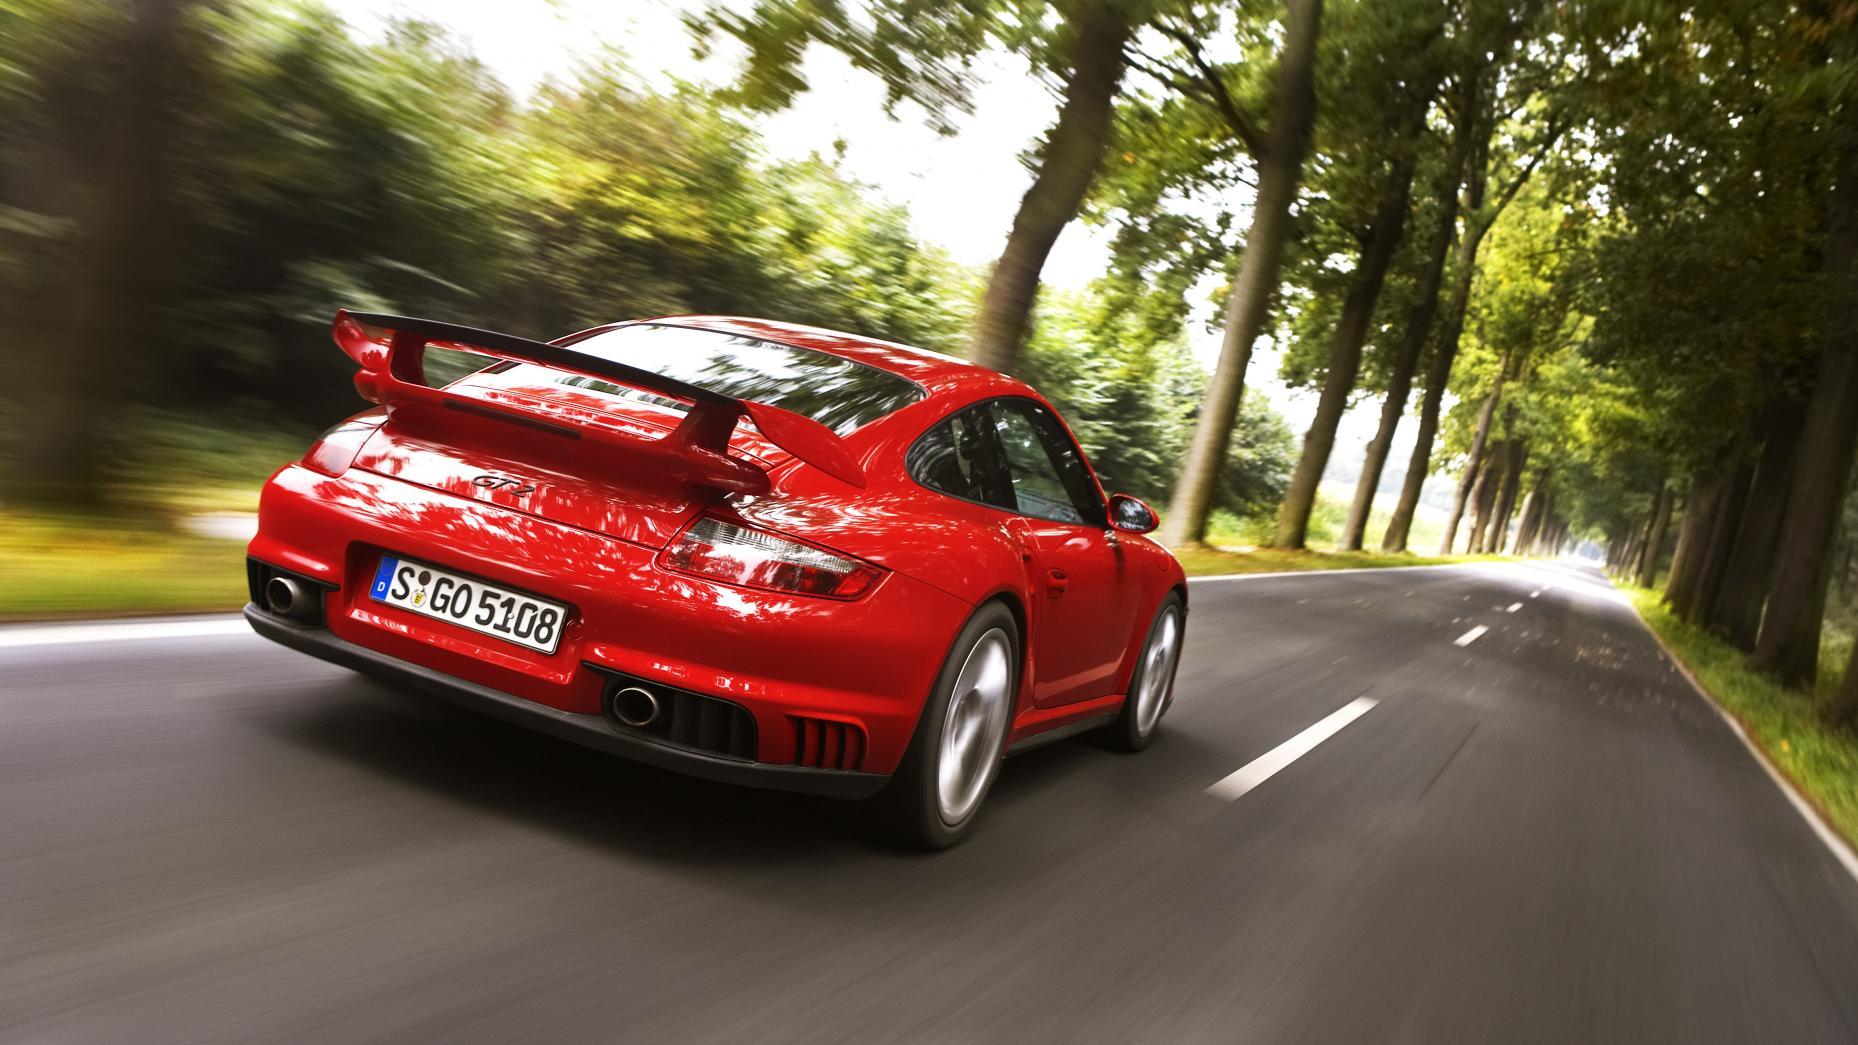 porsche 911 turbo vs 911 gt2 vs 911 gt3. Black Bedroom Furniture Sets. Home Design Ideas